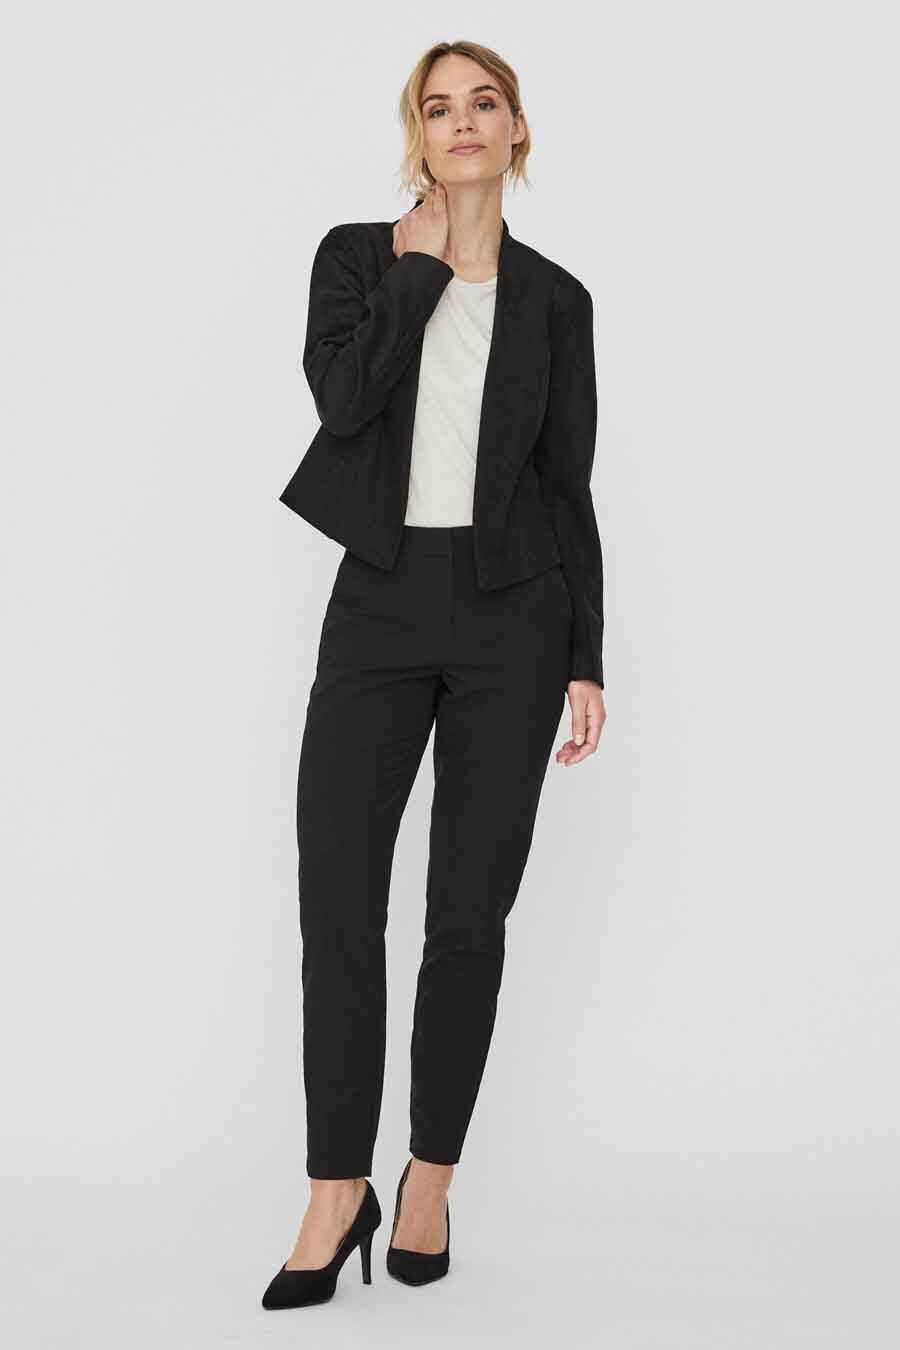 Vero Moda® Blazer, Zwart, Dames, Maat: 38/40/42